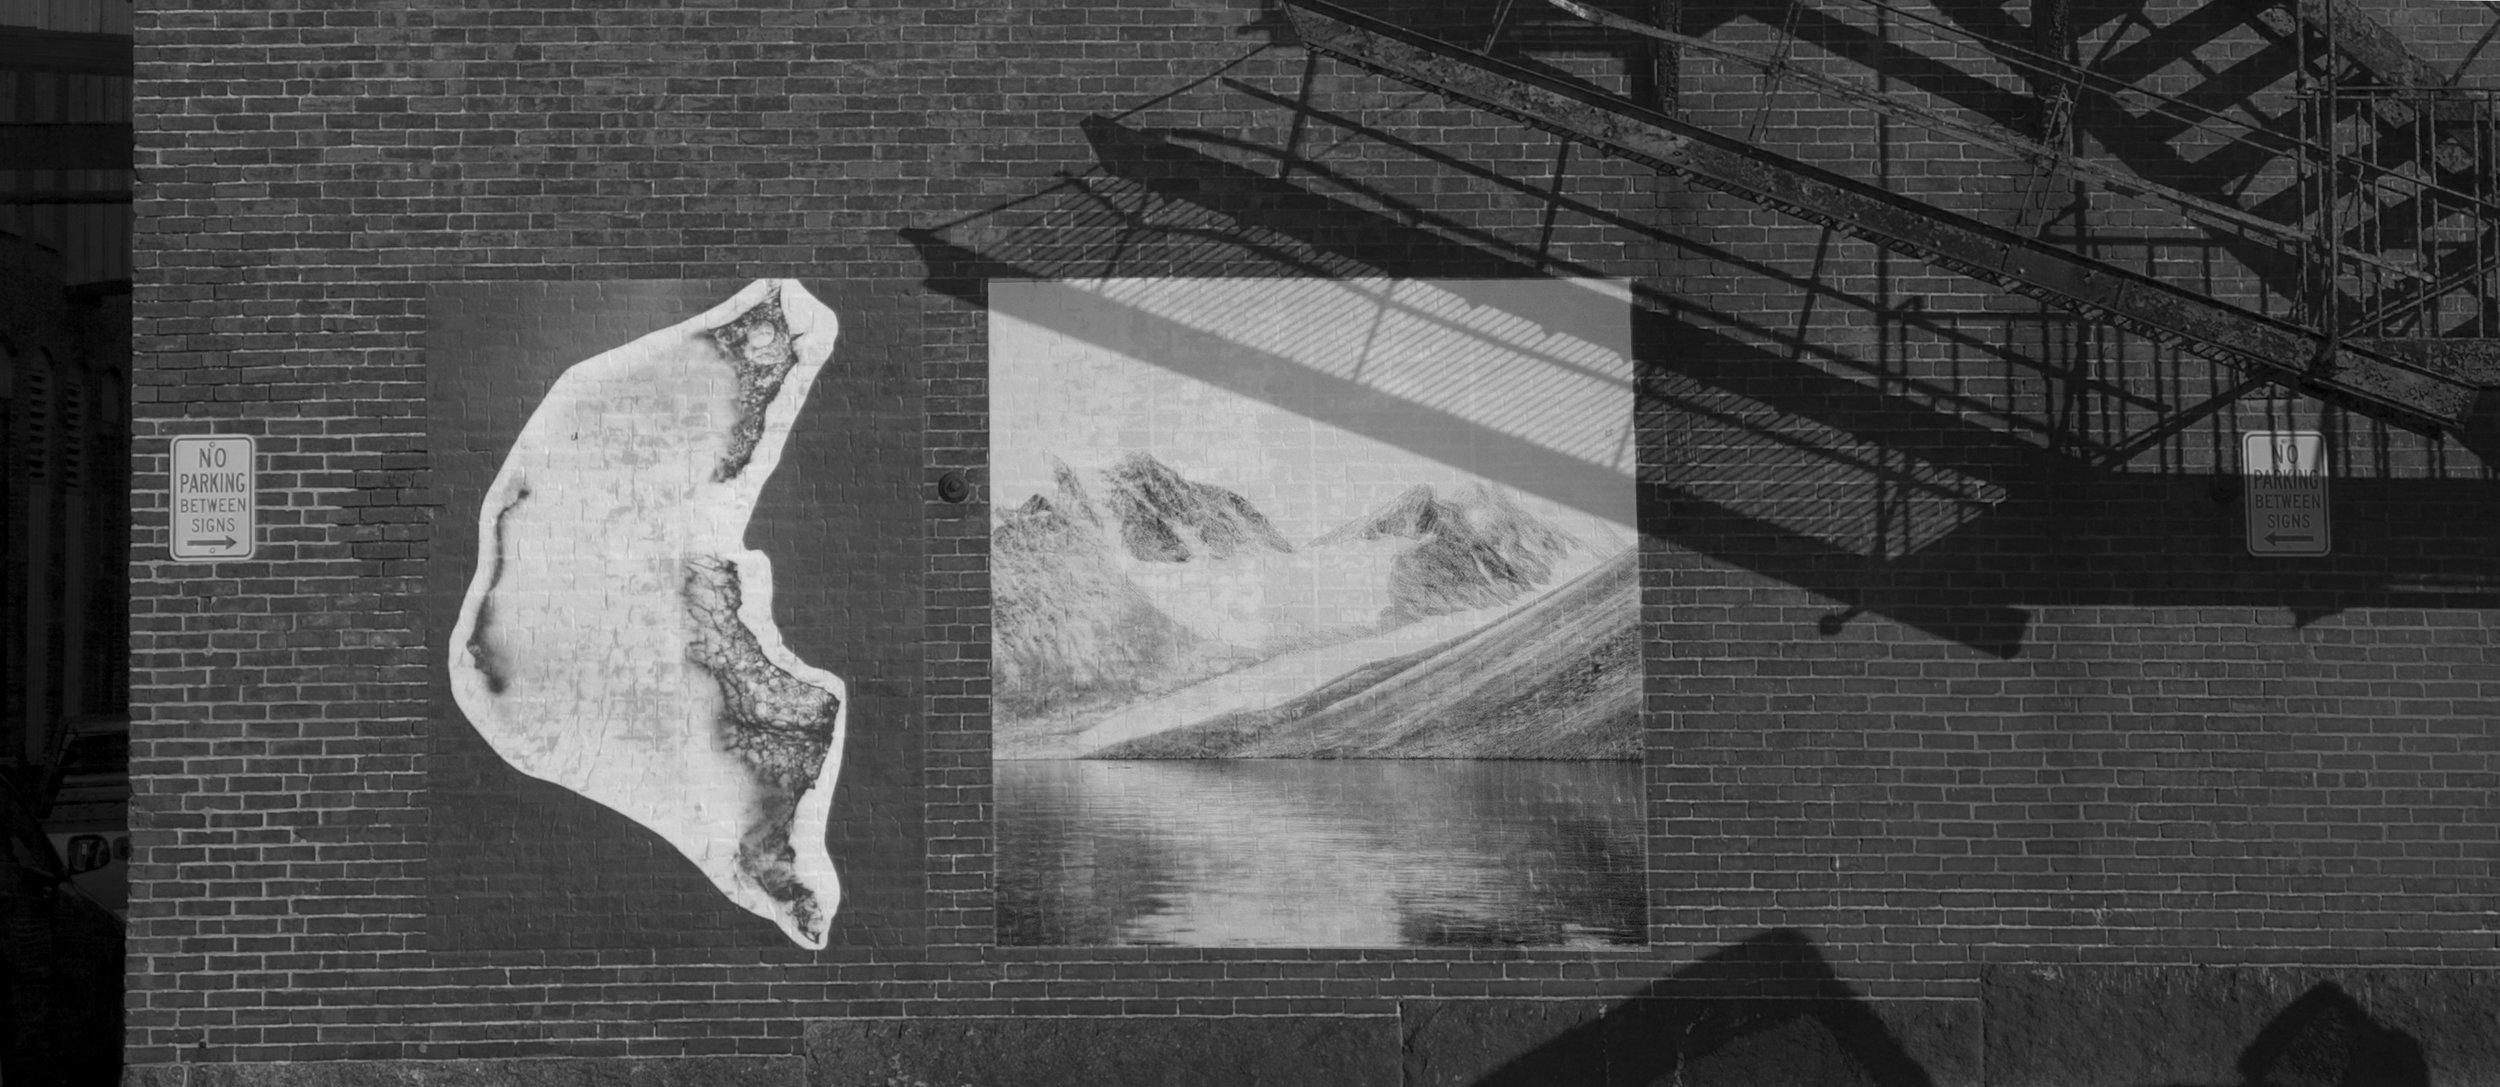 "CHATTERMARK mural installed  B iddeford, Maine: November 9, 2017, Size: 96""x174"" Pairing includes: Photogram ,Beloit Glacier Ice #2  Photograph , Madgalenafjord, Graveneset Glacier, Svalbard, Norway  Images © Shoshannah White"